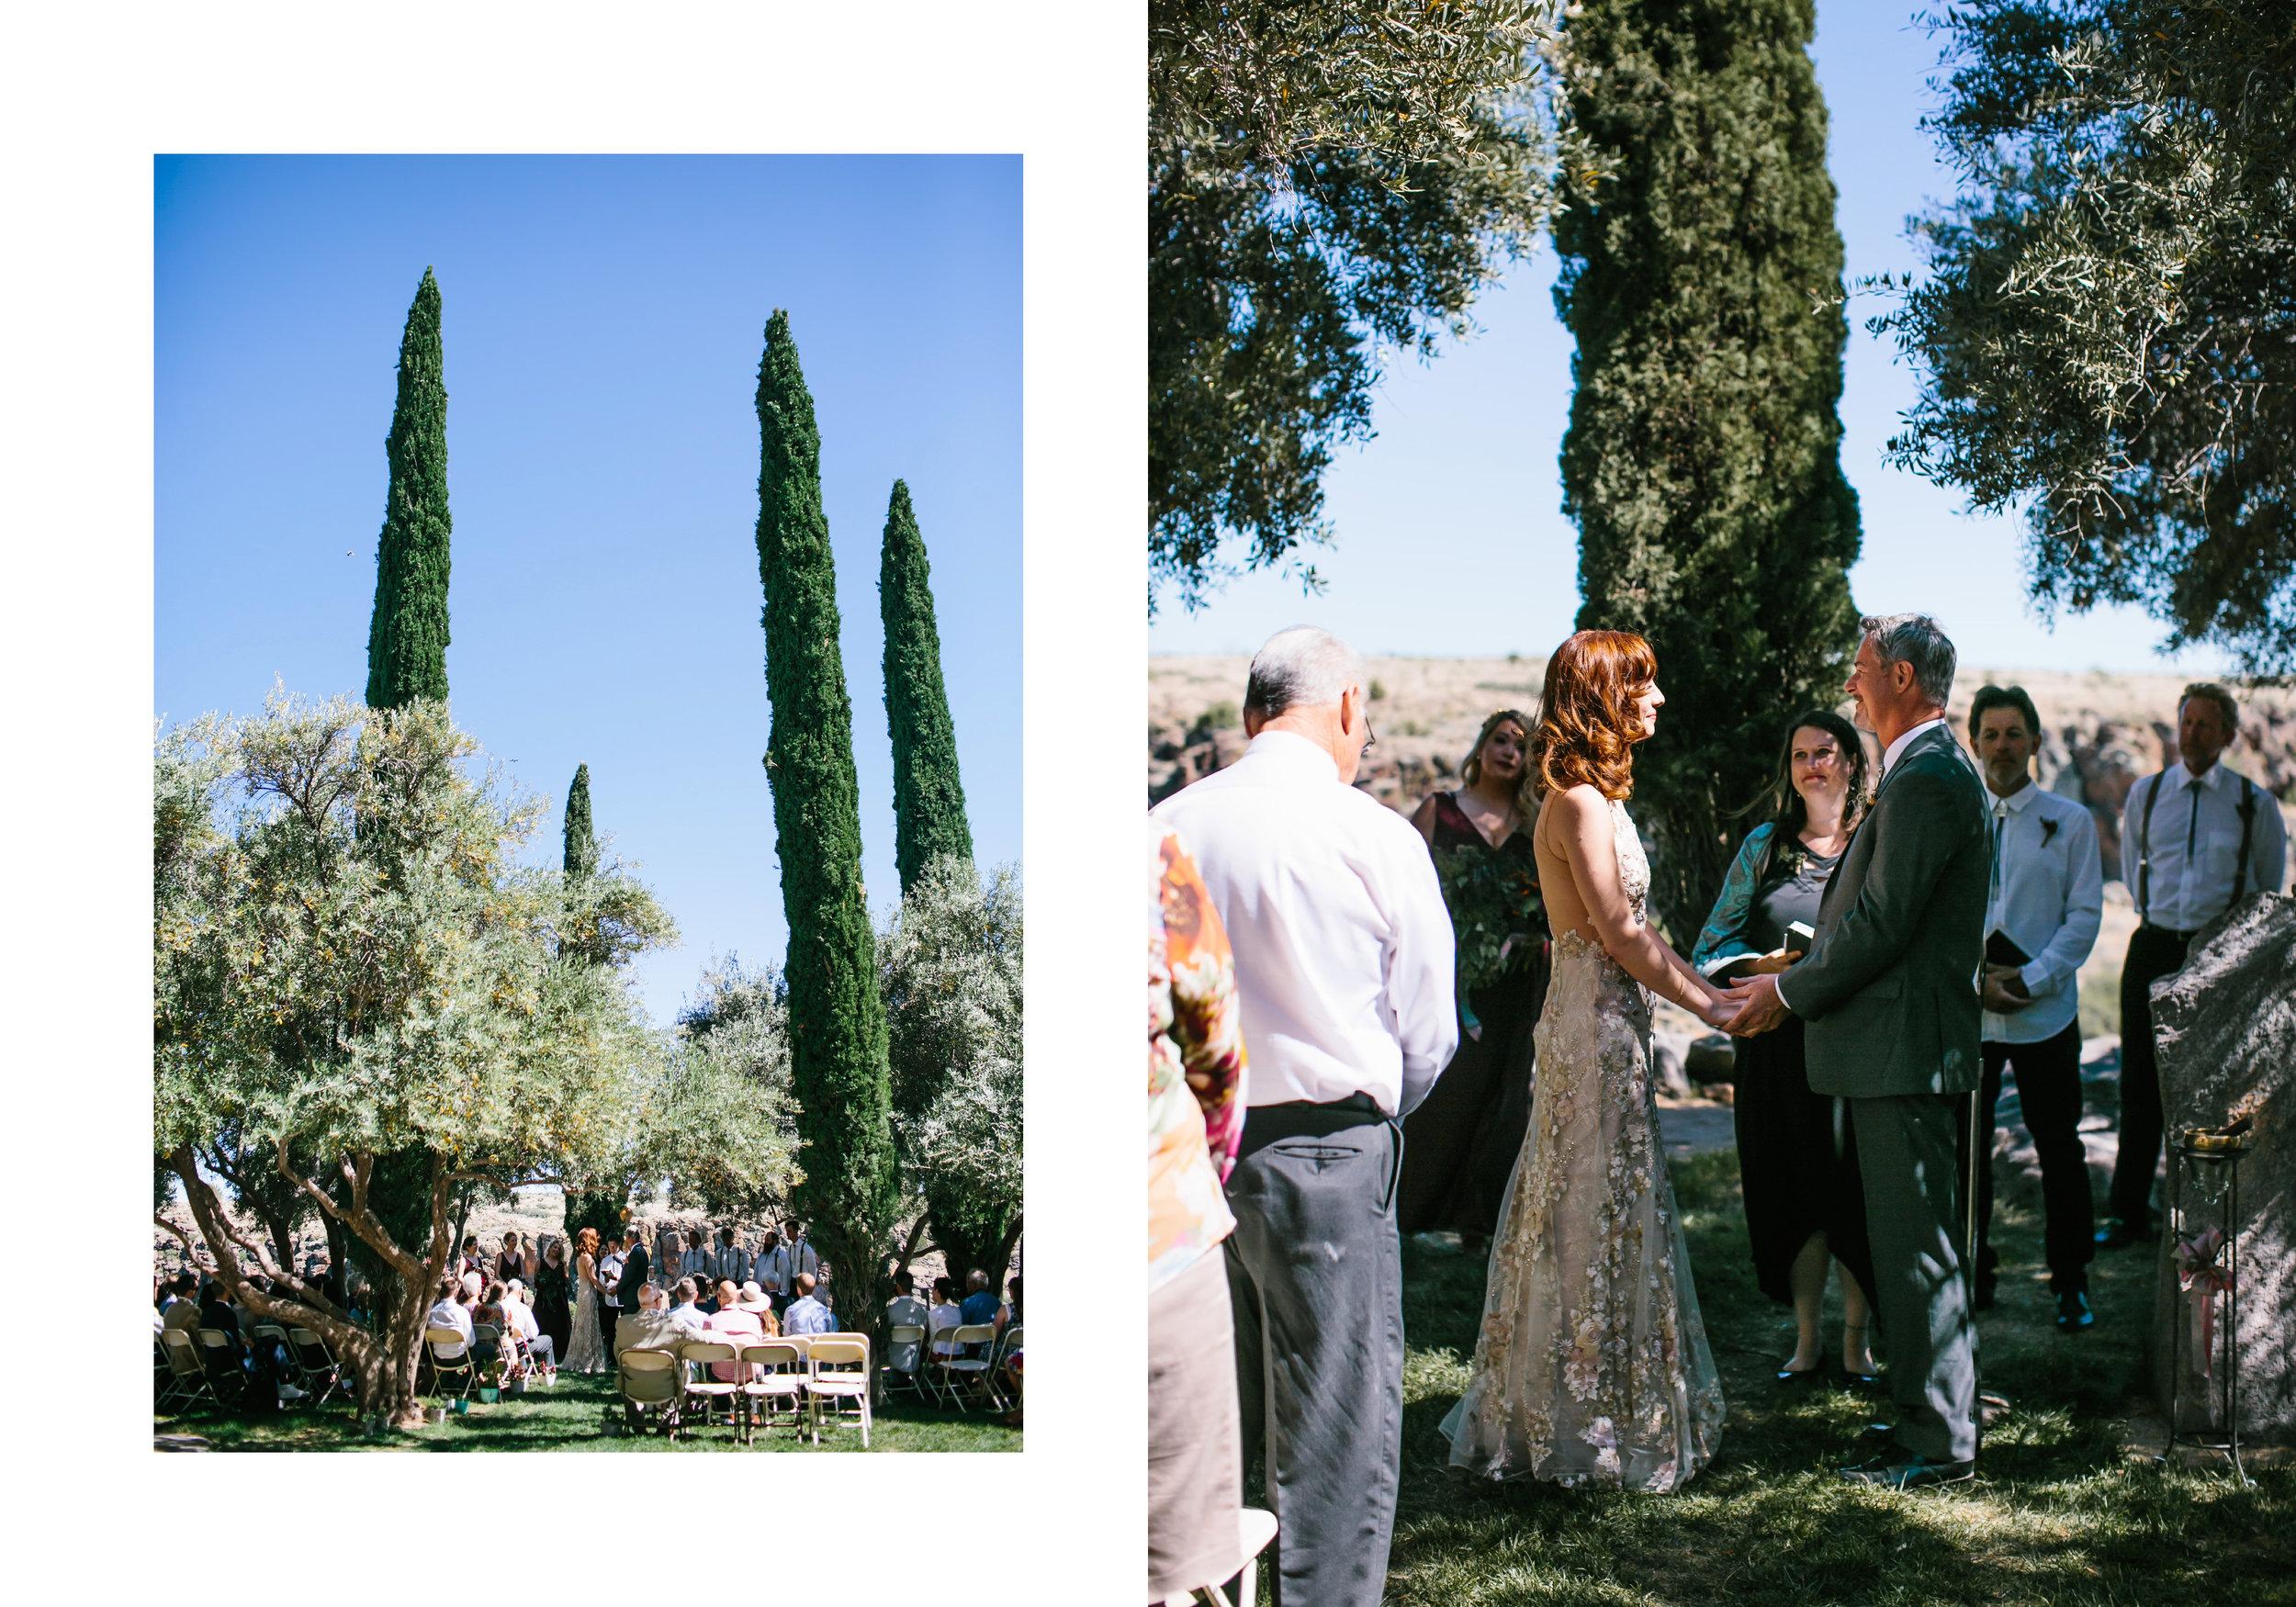 arcosanti-wedding-photography0017.JPG